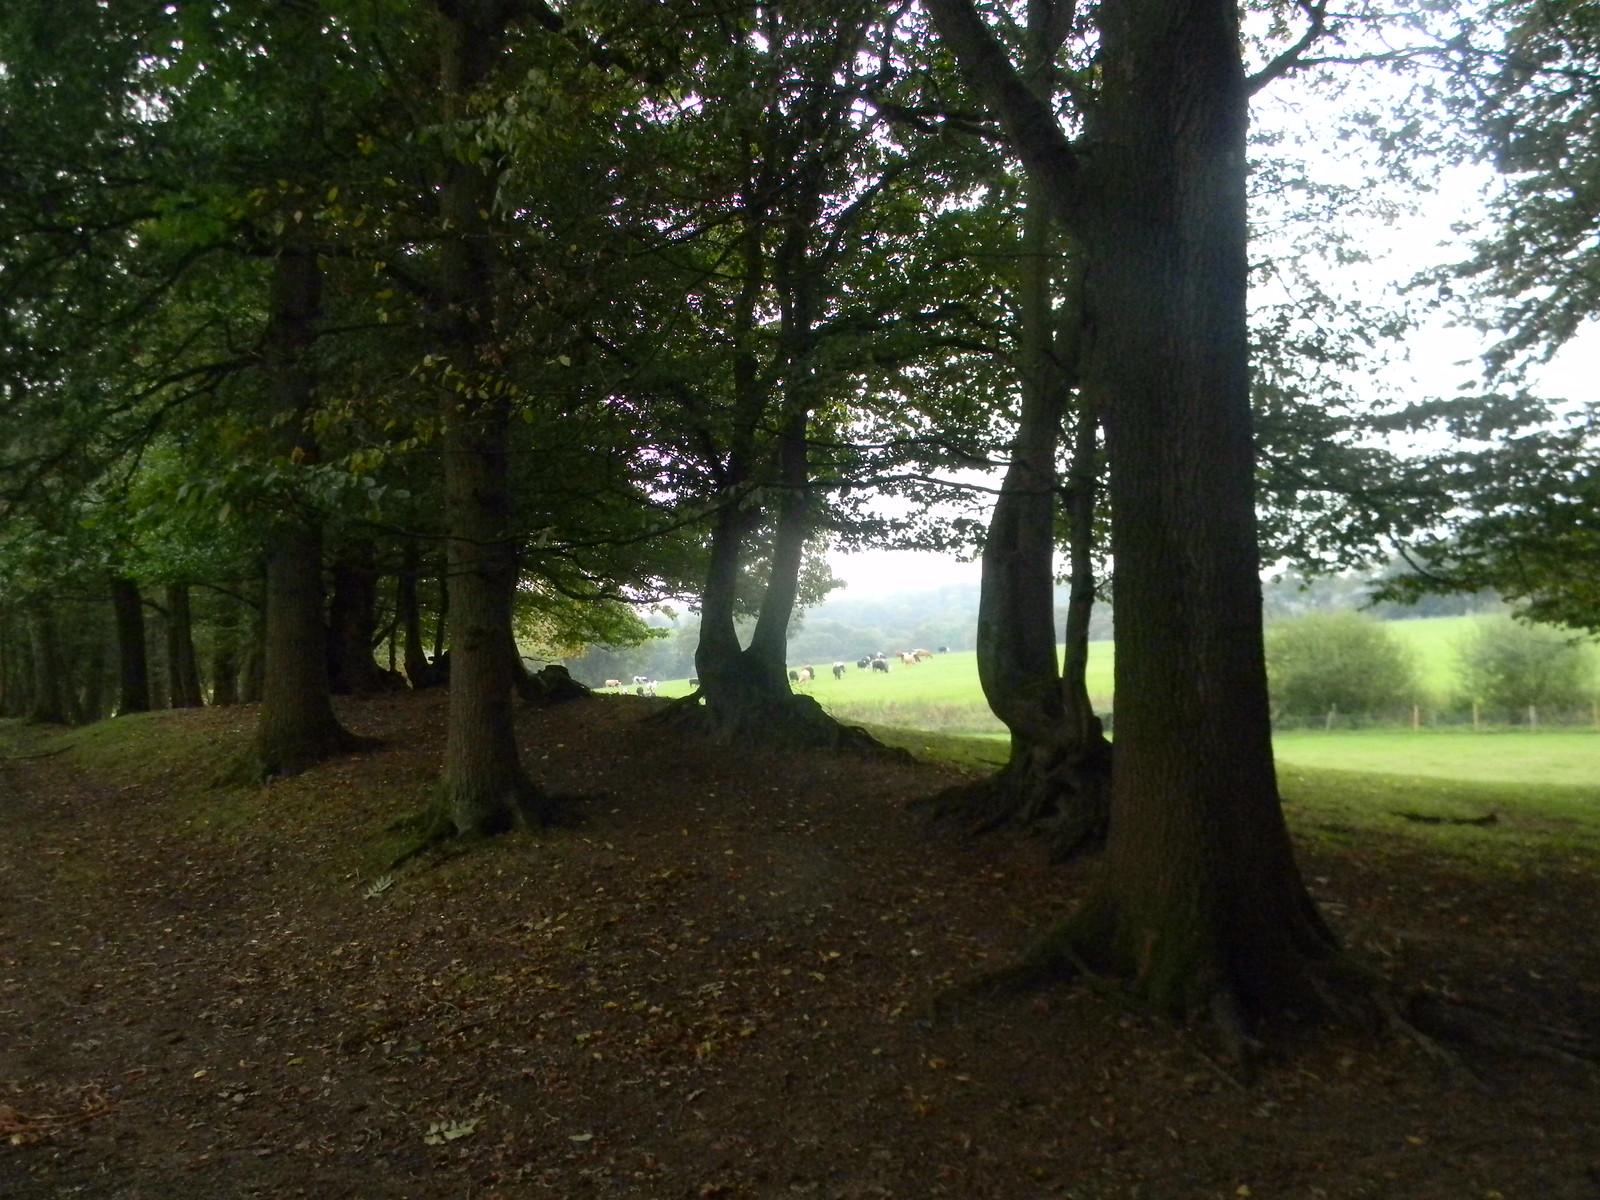 Cows through trees Ockley to Warnham